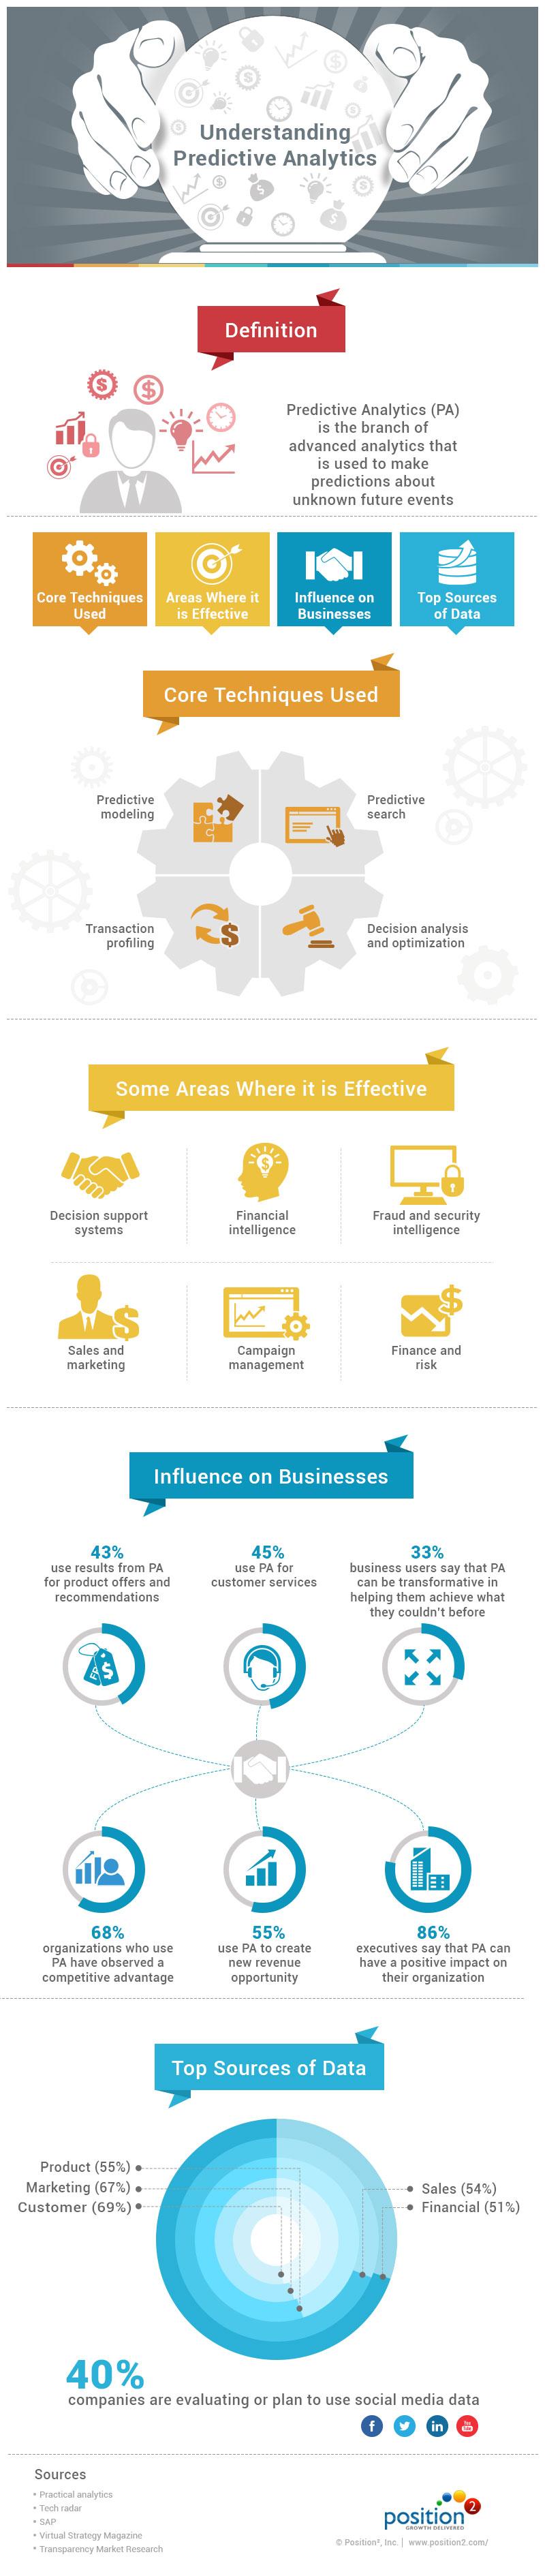 understanding #predictive #analytics- #infographic | a digital